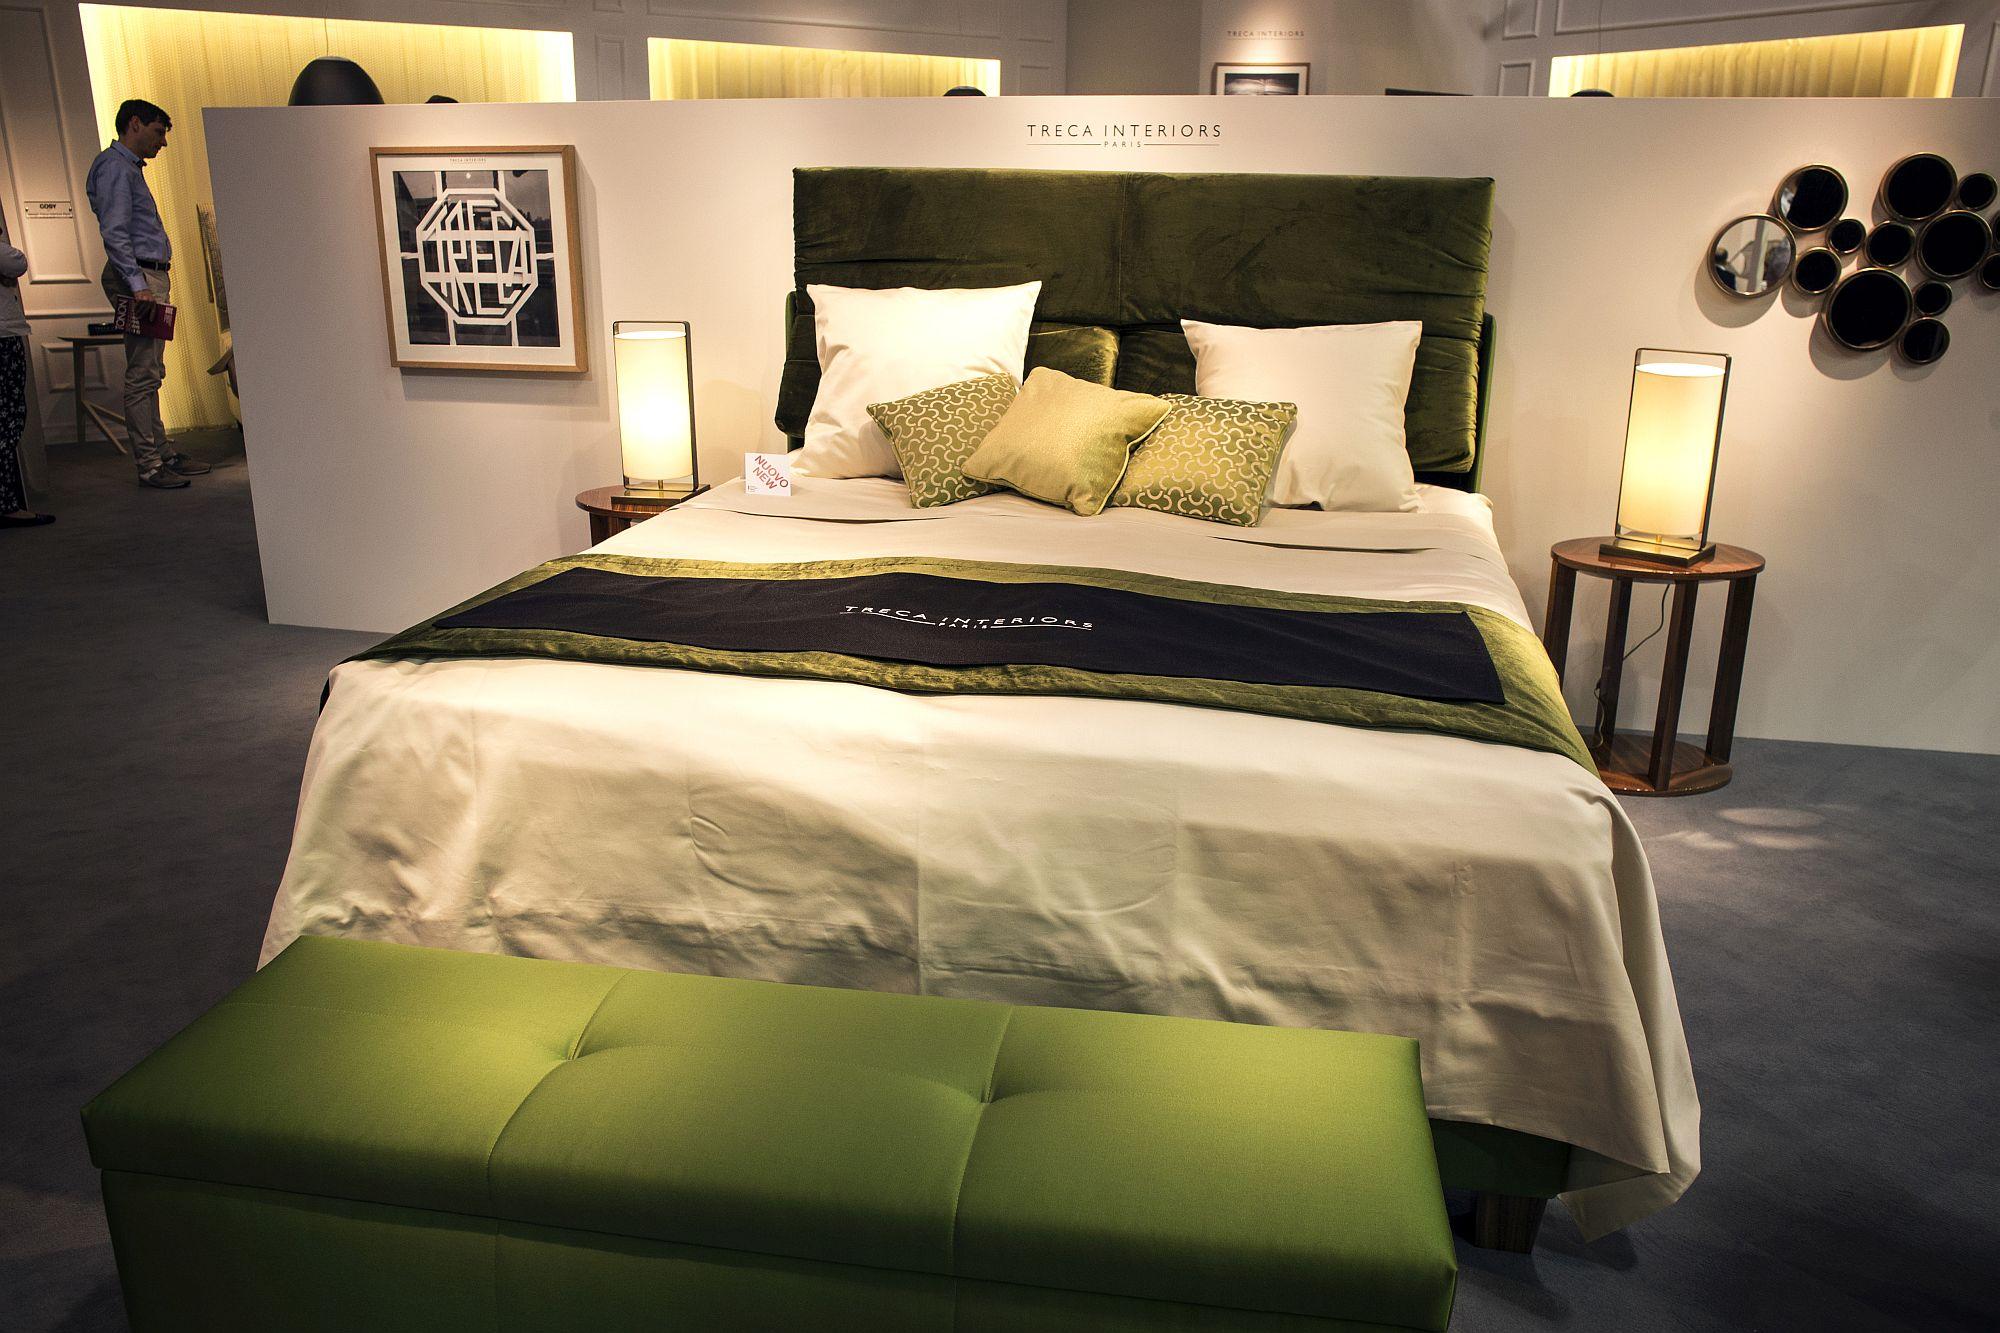 Relaxing modern bedroom inspiration from Treca Interiors